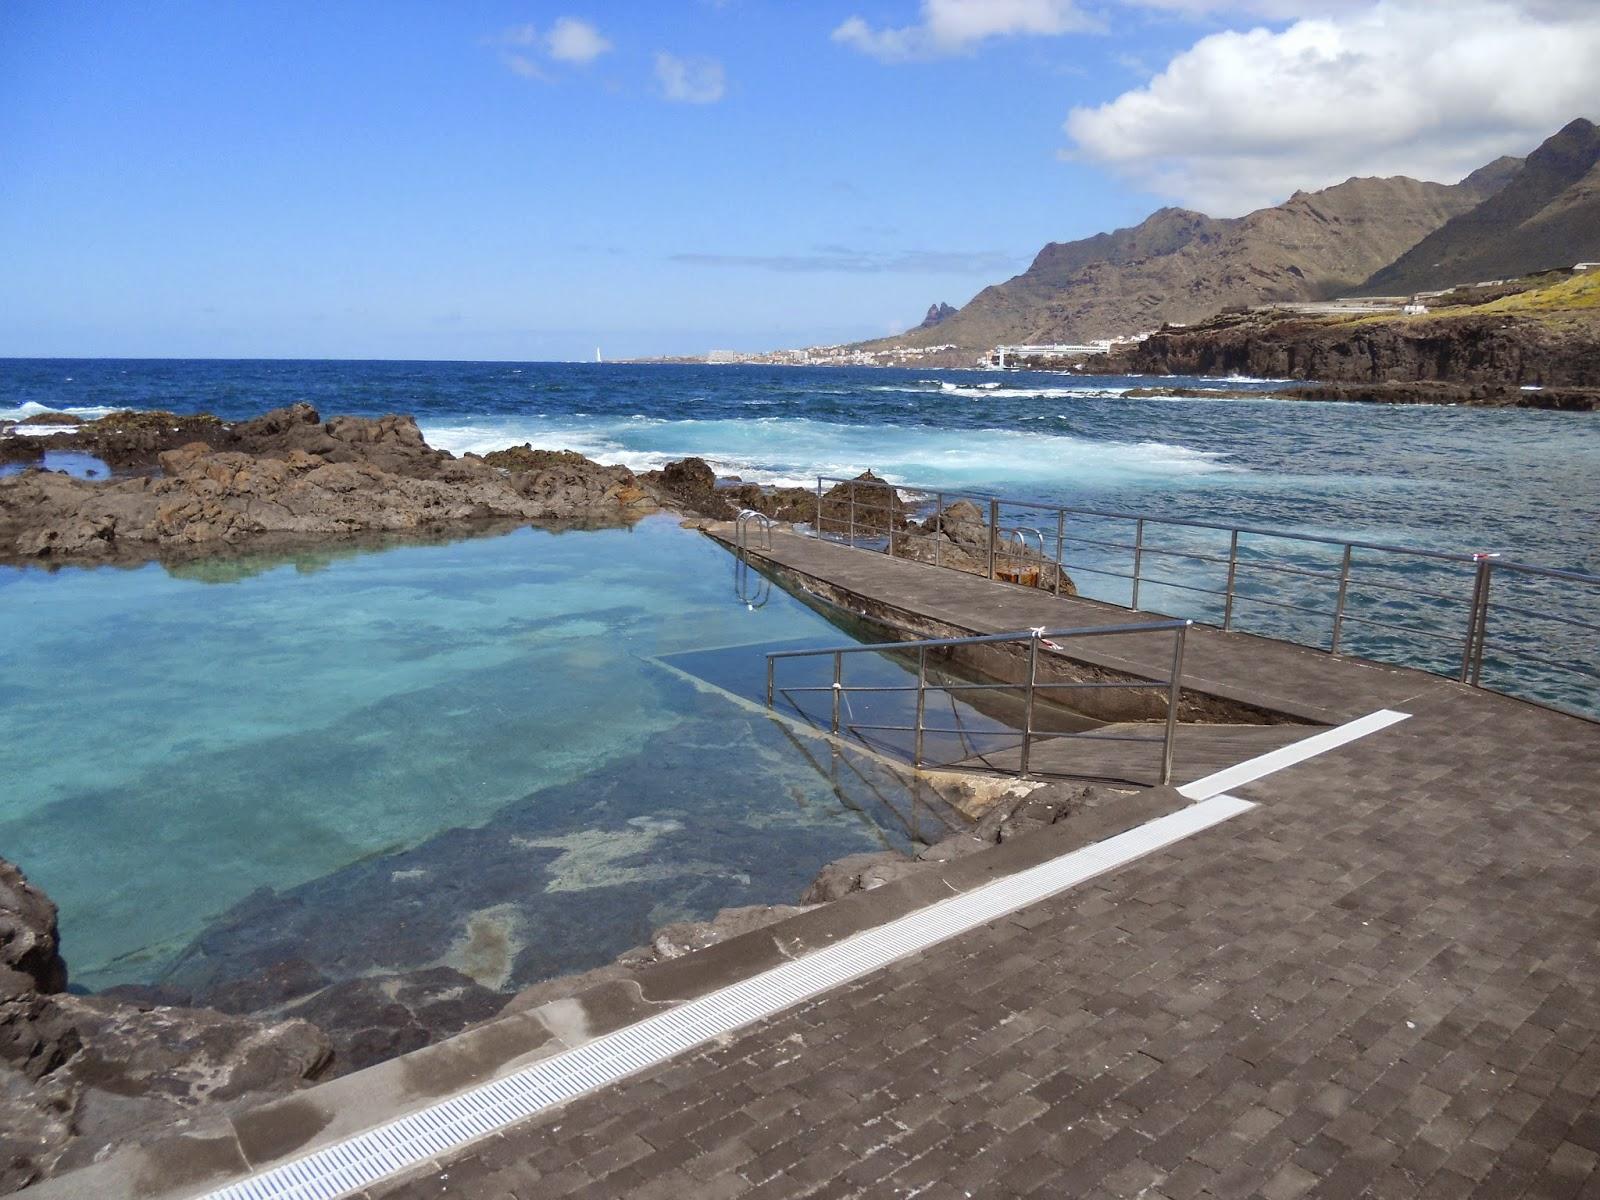 Lugares de tenerife rincones piscina natural de j ver for Piscina natural tenerife